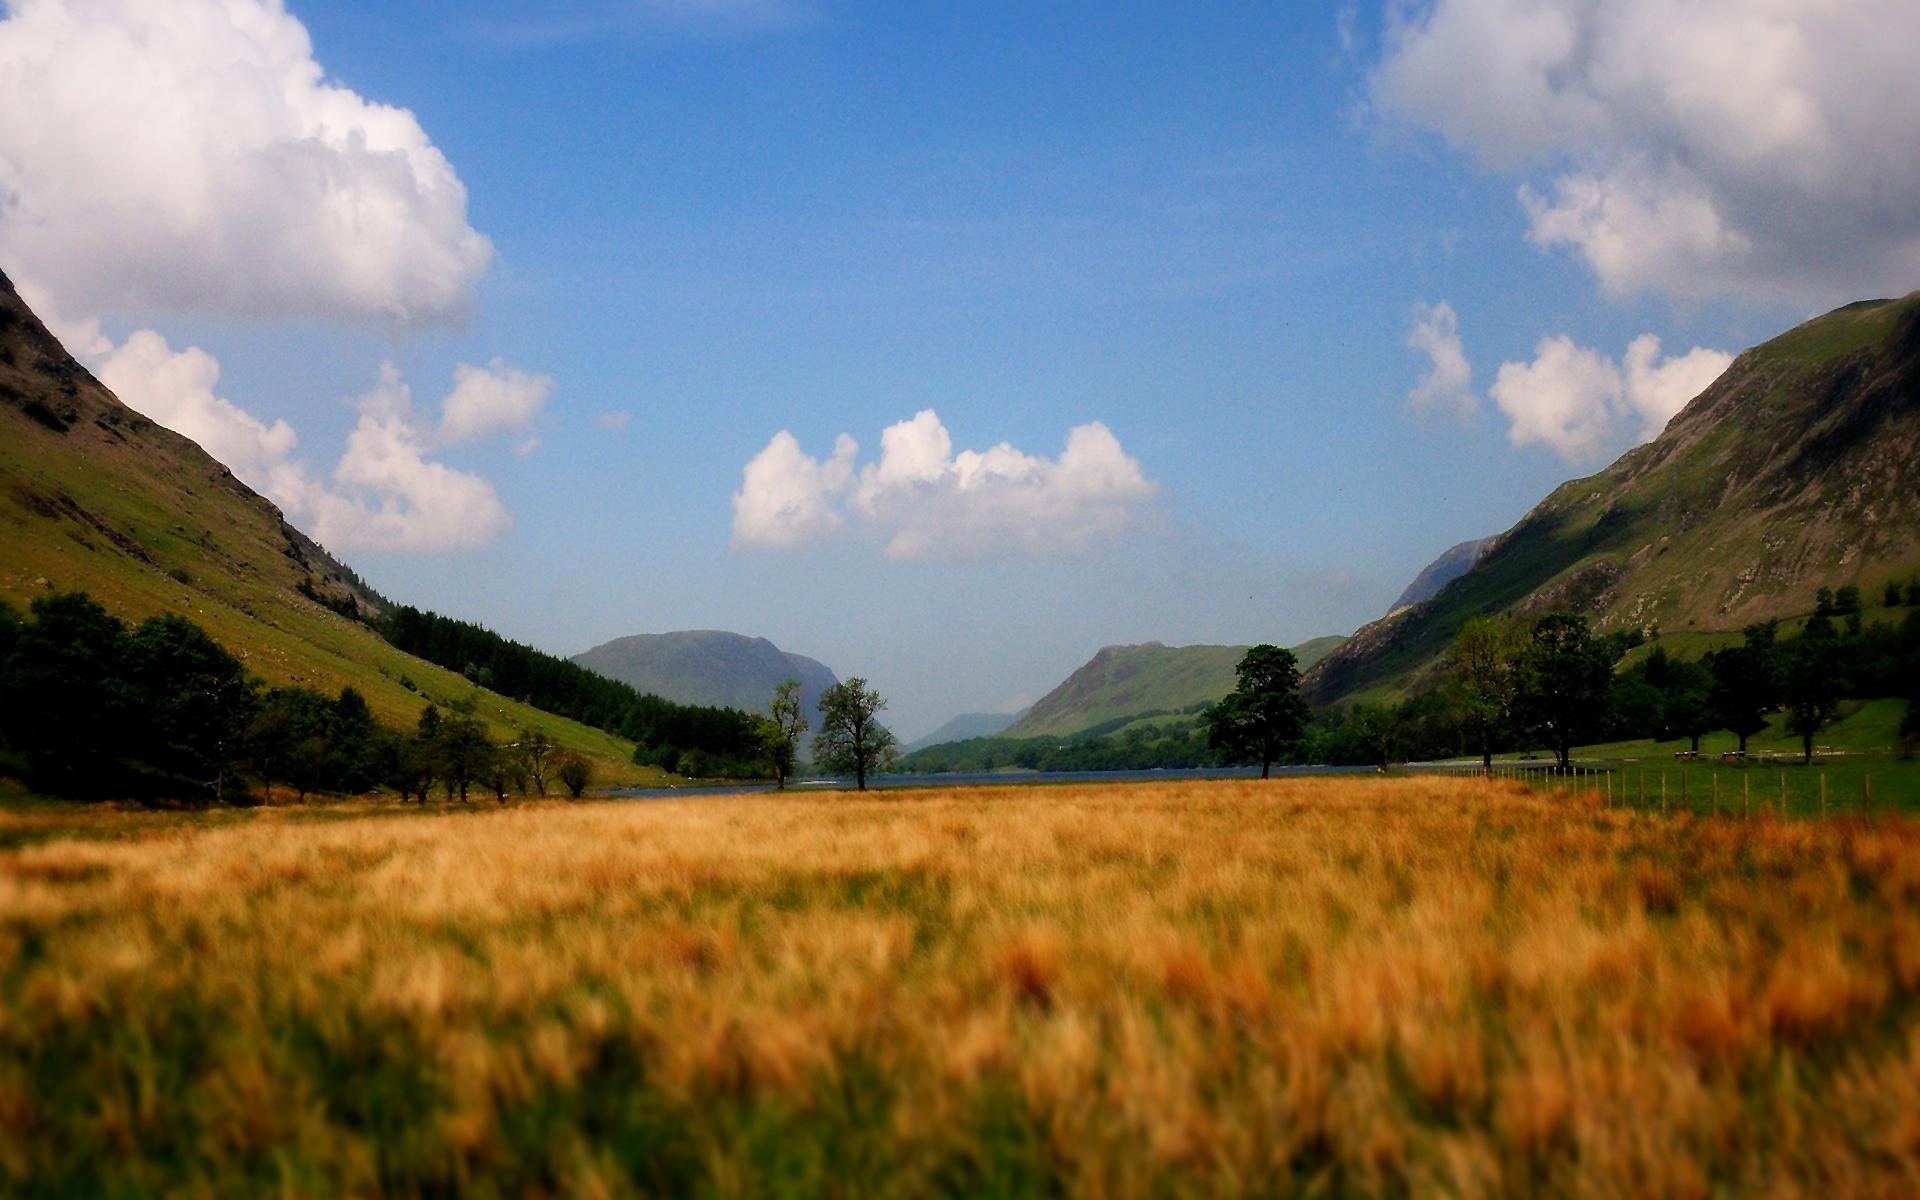 Valley cornfield hills